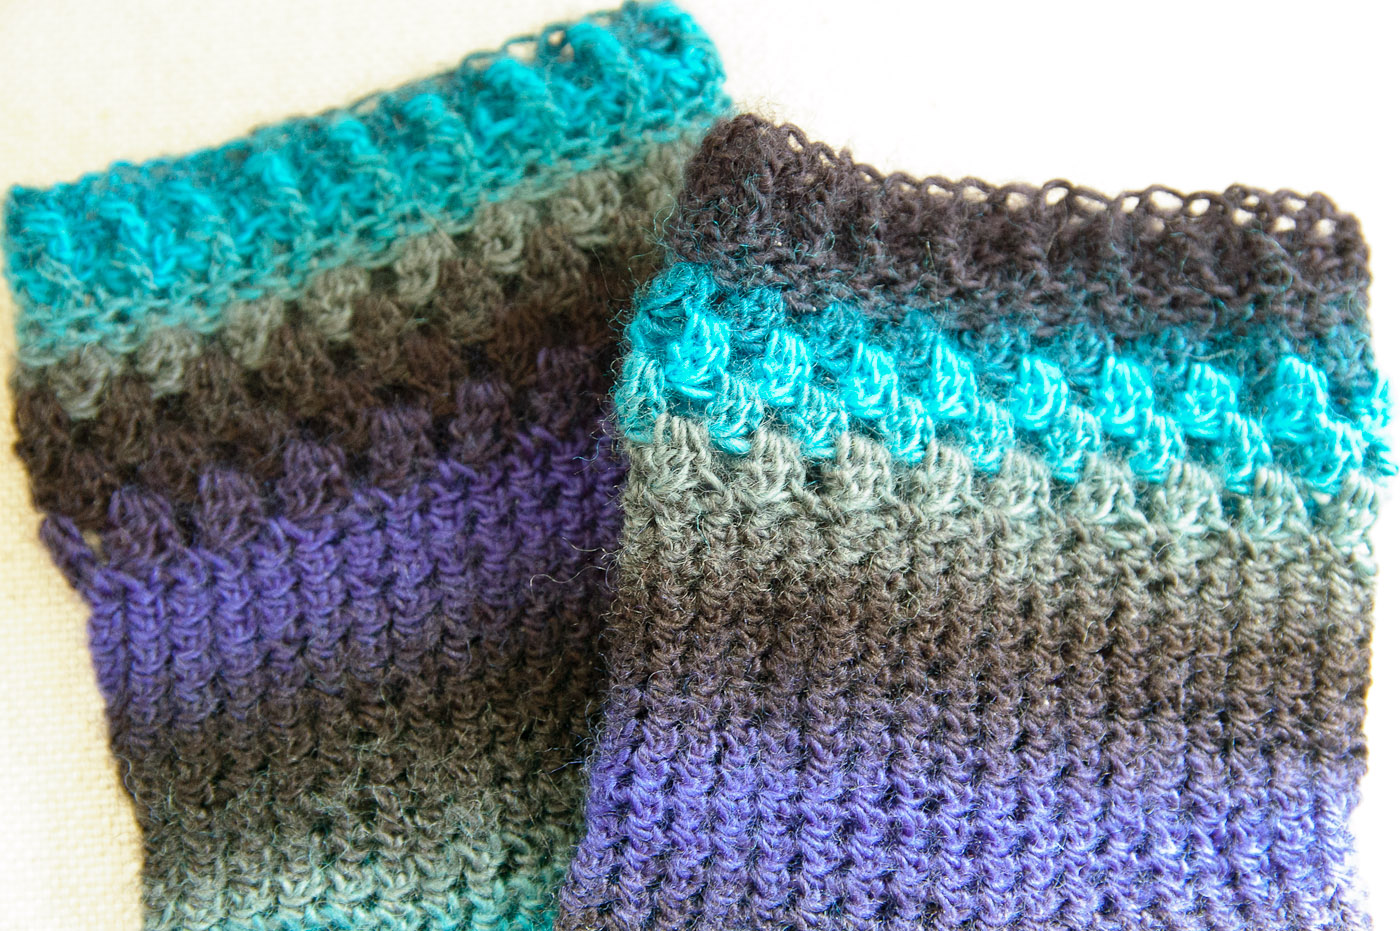 Crocheting Socks : Hilly Town Blue: FO Friday: Crochet Socks